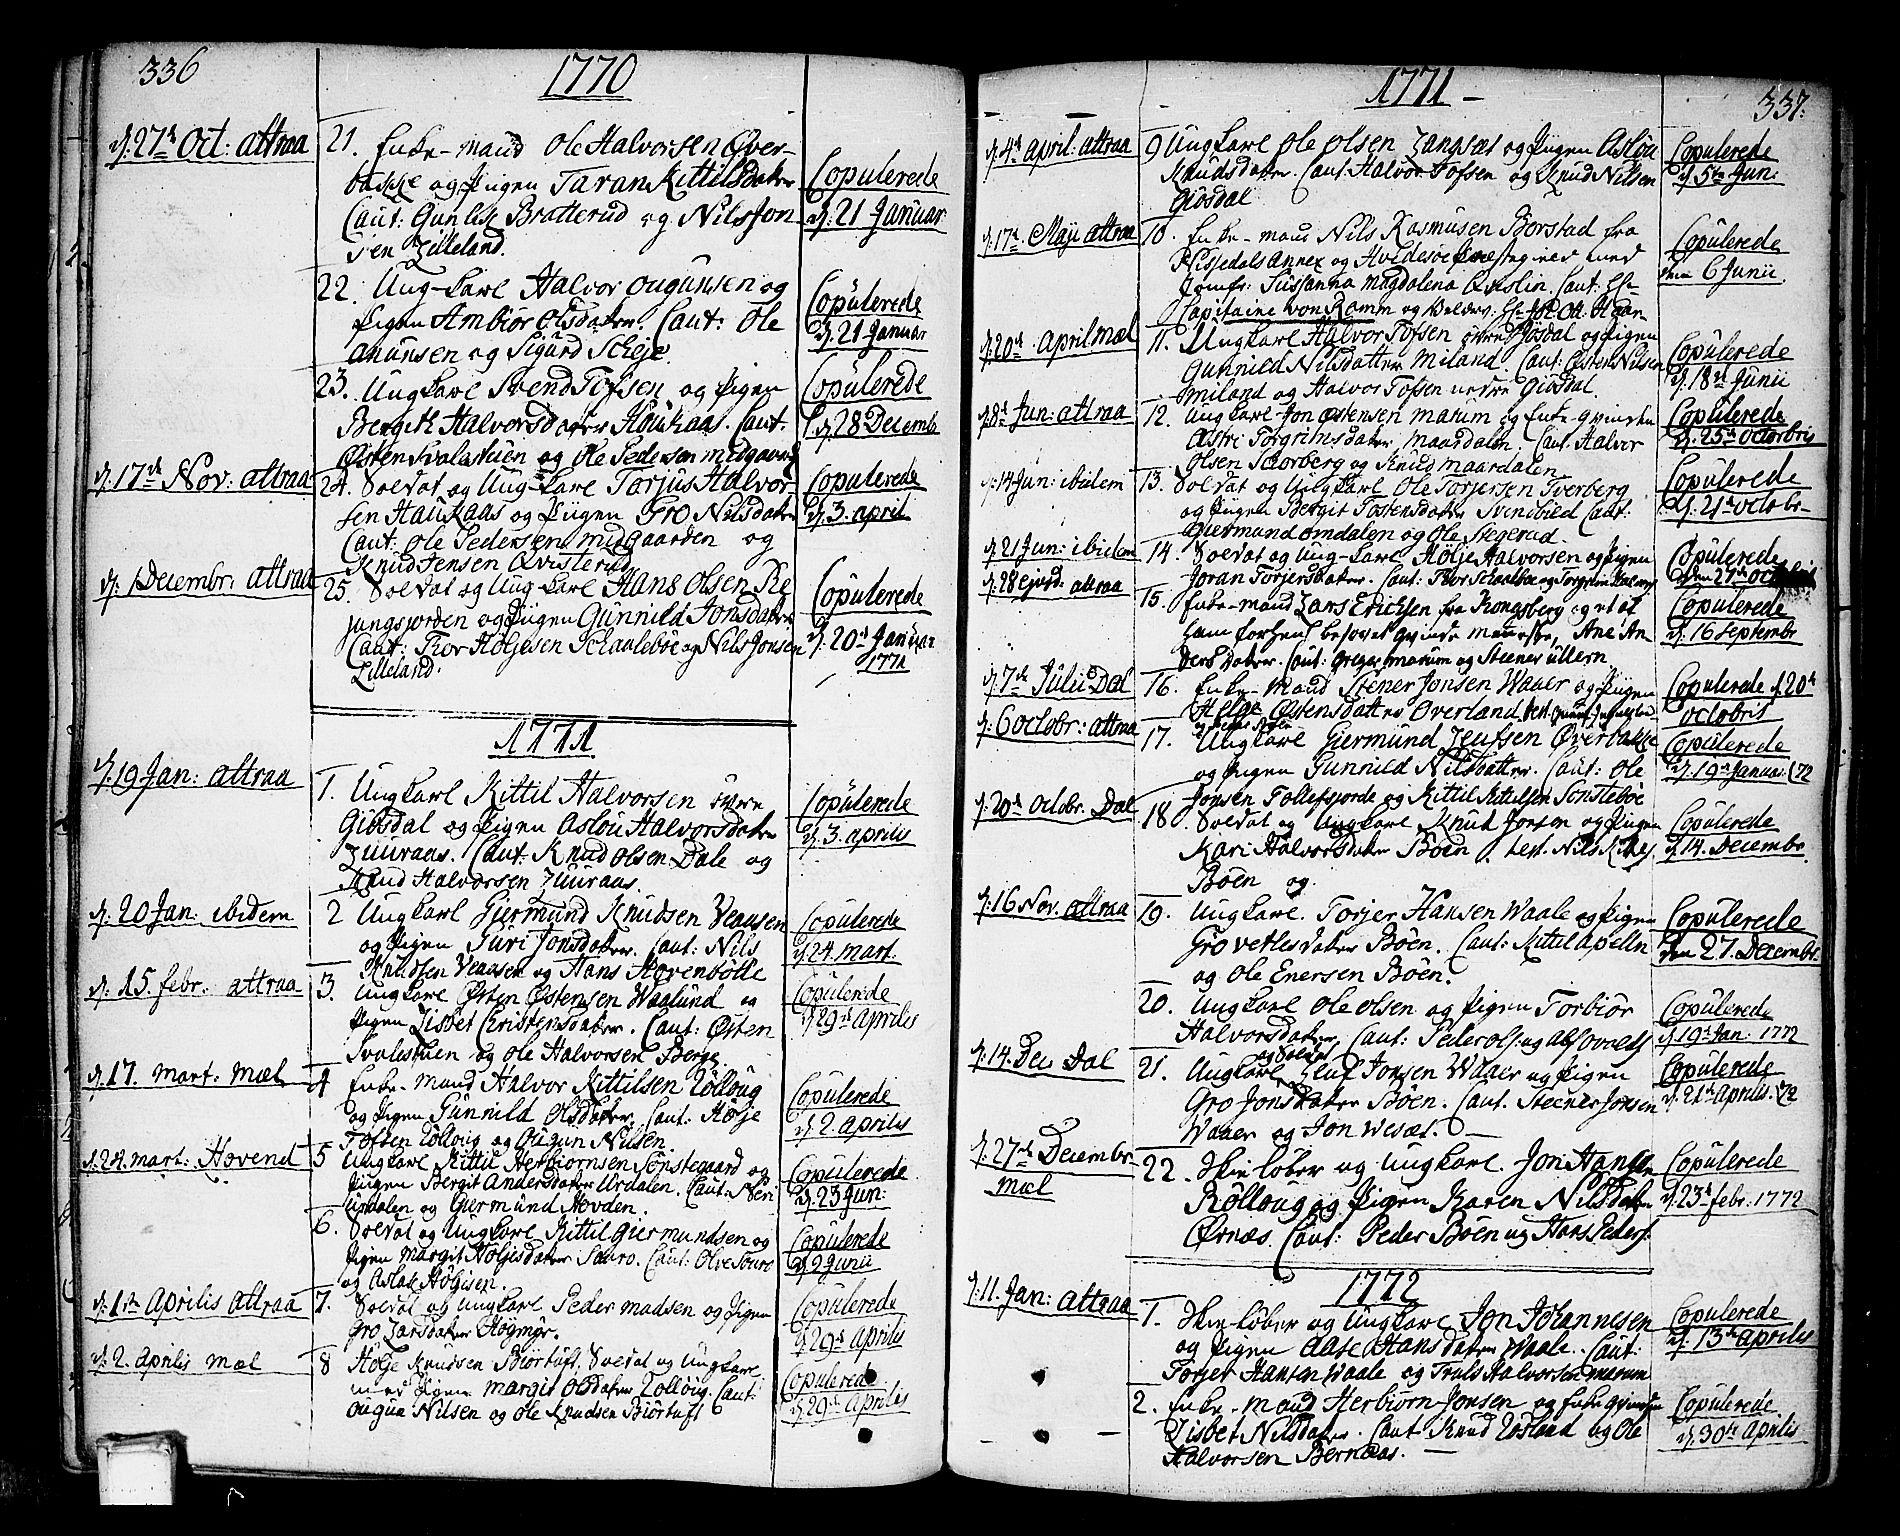 SAKO, Tinn kirkebøker, F/Fa/L0002: Ministerialbok nr. I 2, 1757-1810, s. 336-337